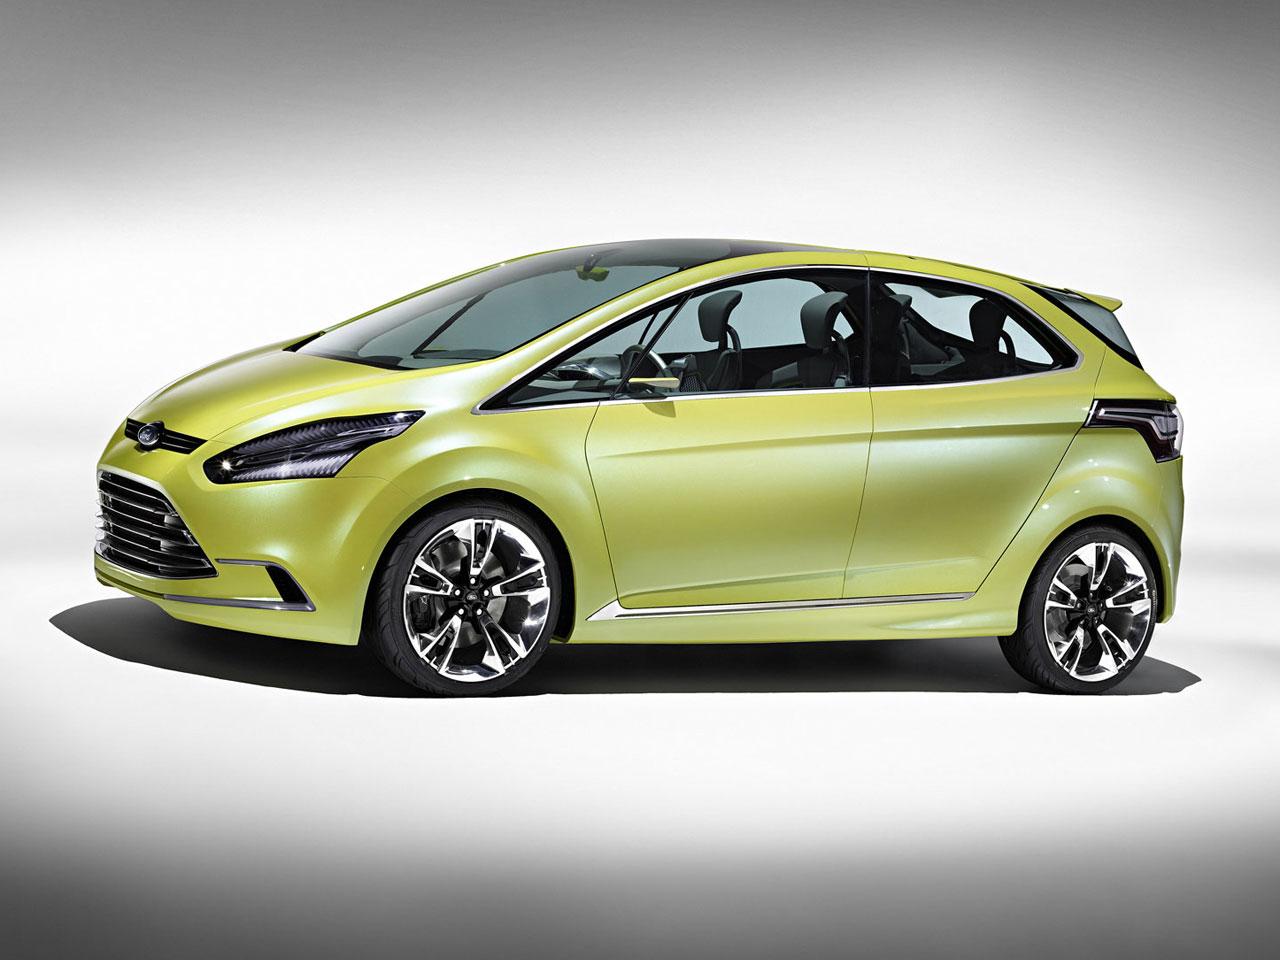 Ford iosis MAX Concept - Car